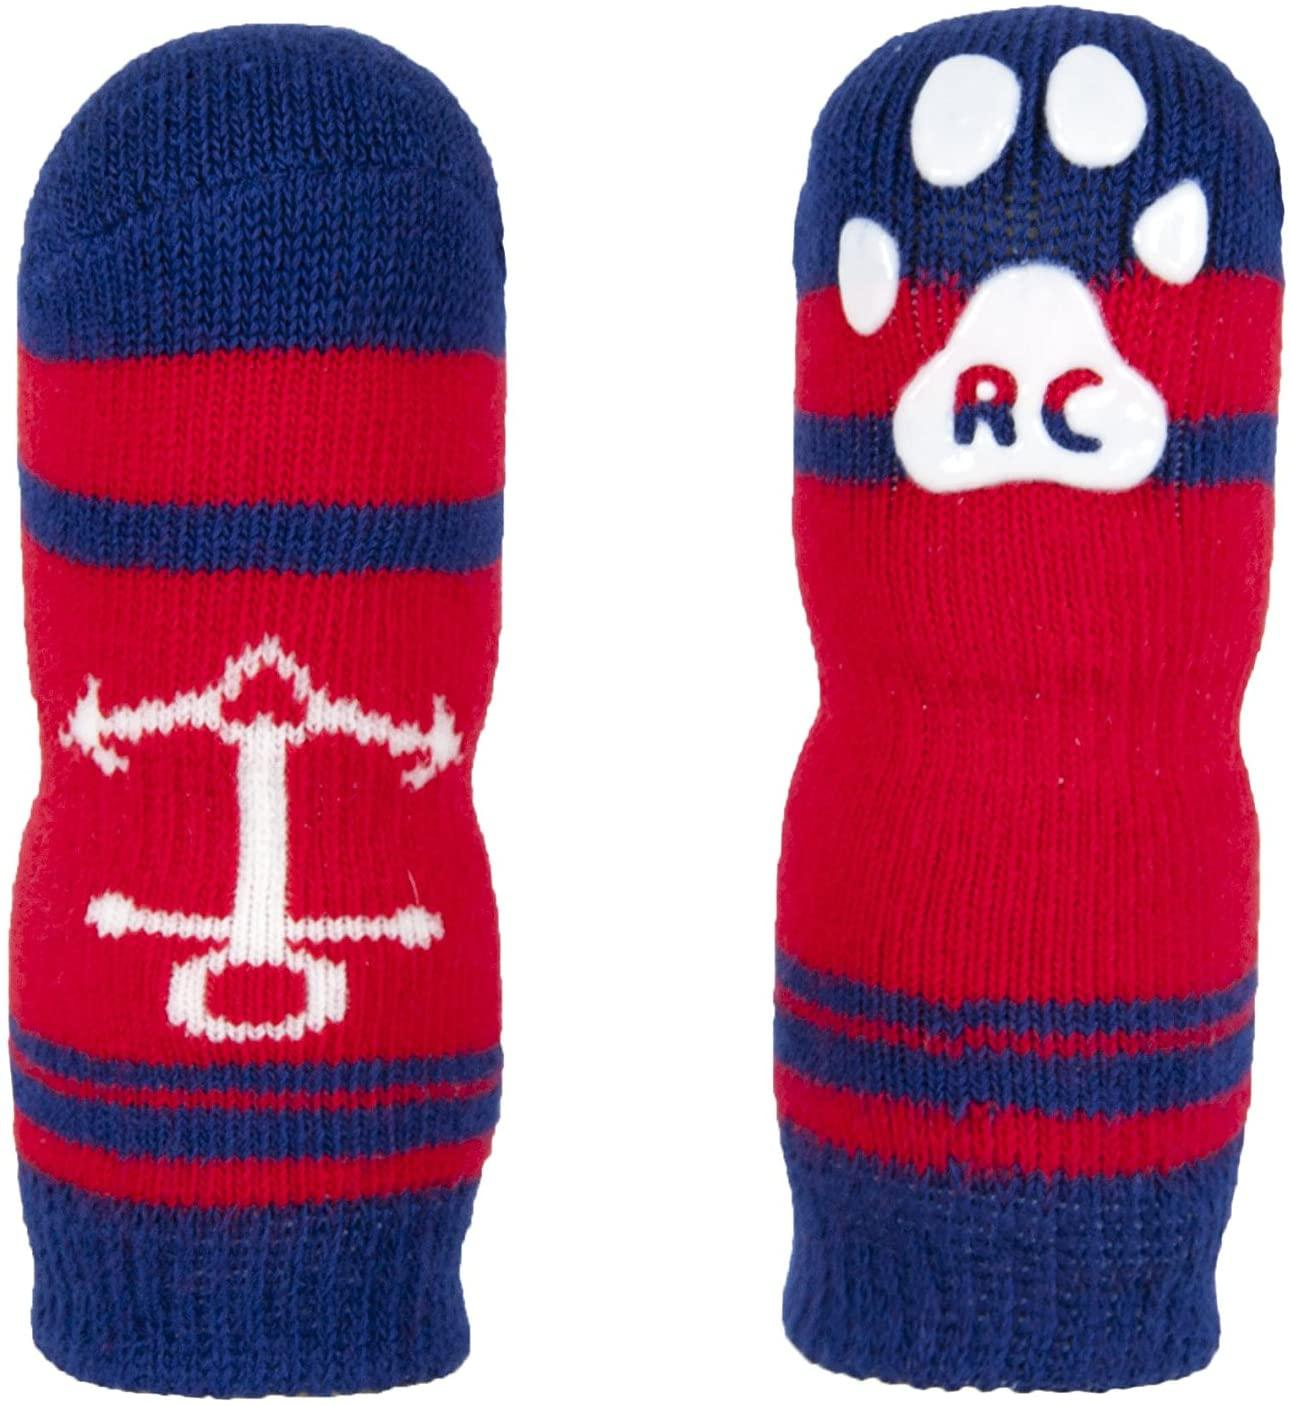 RC Pet Products Pawks Dog Socks, Nautical, Small